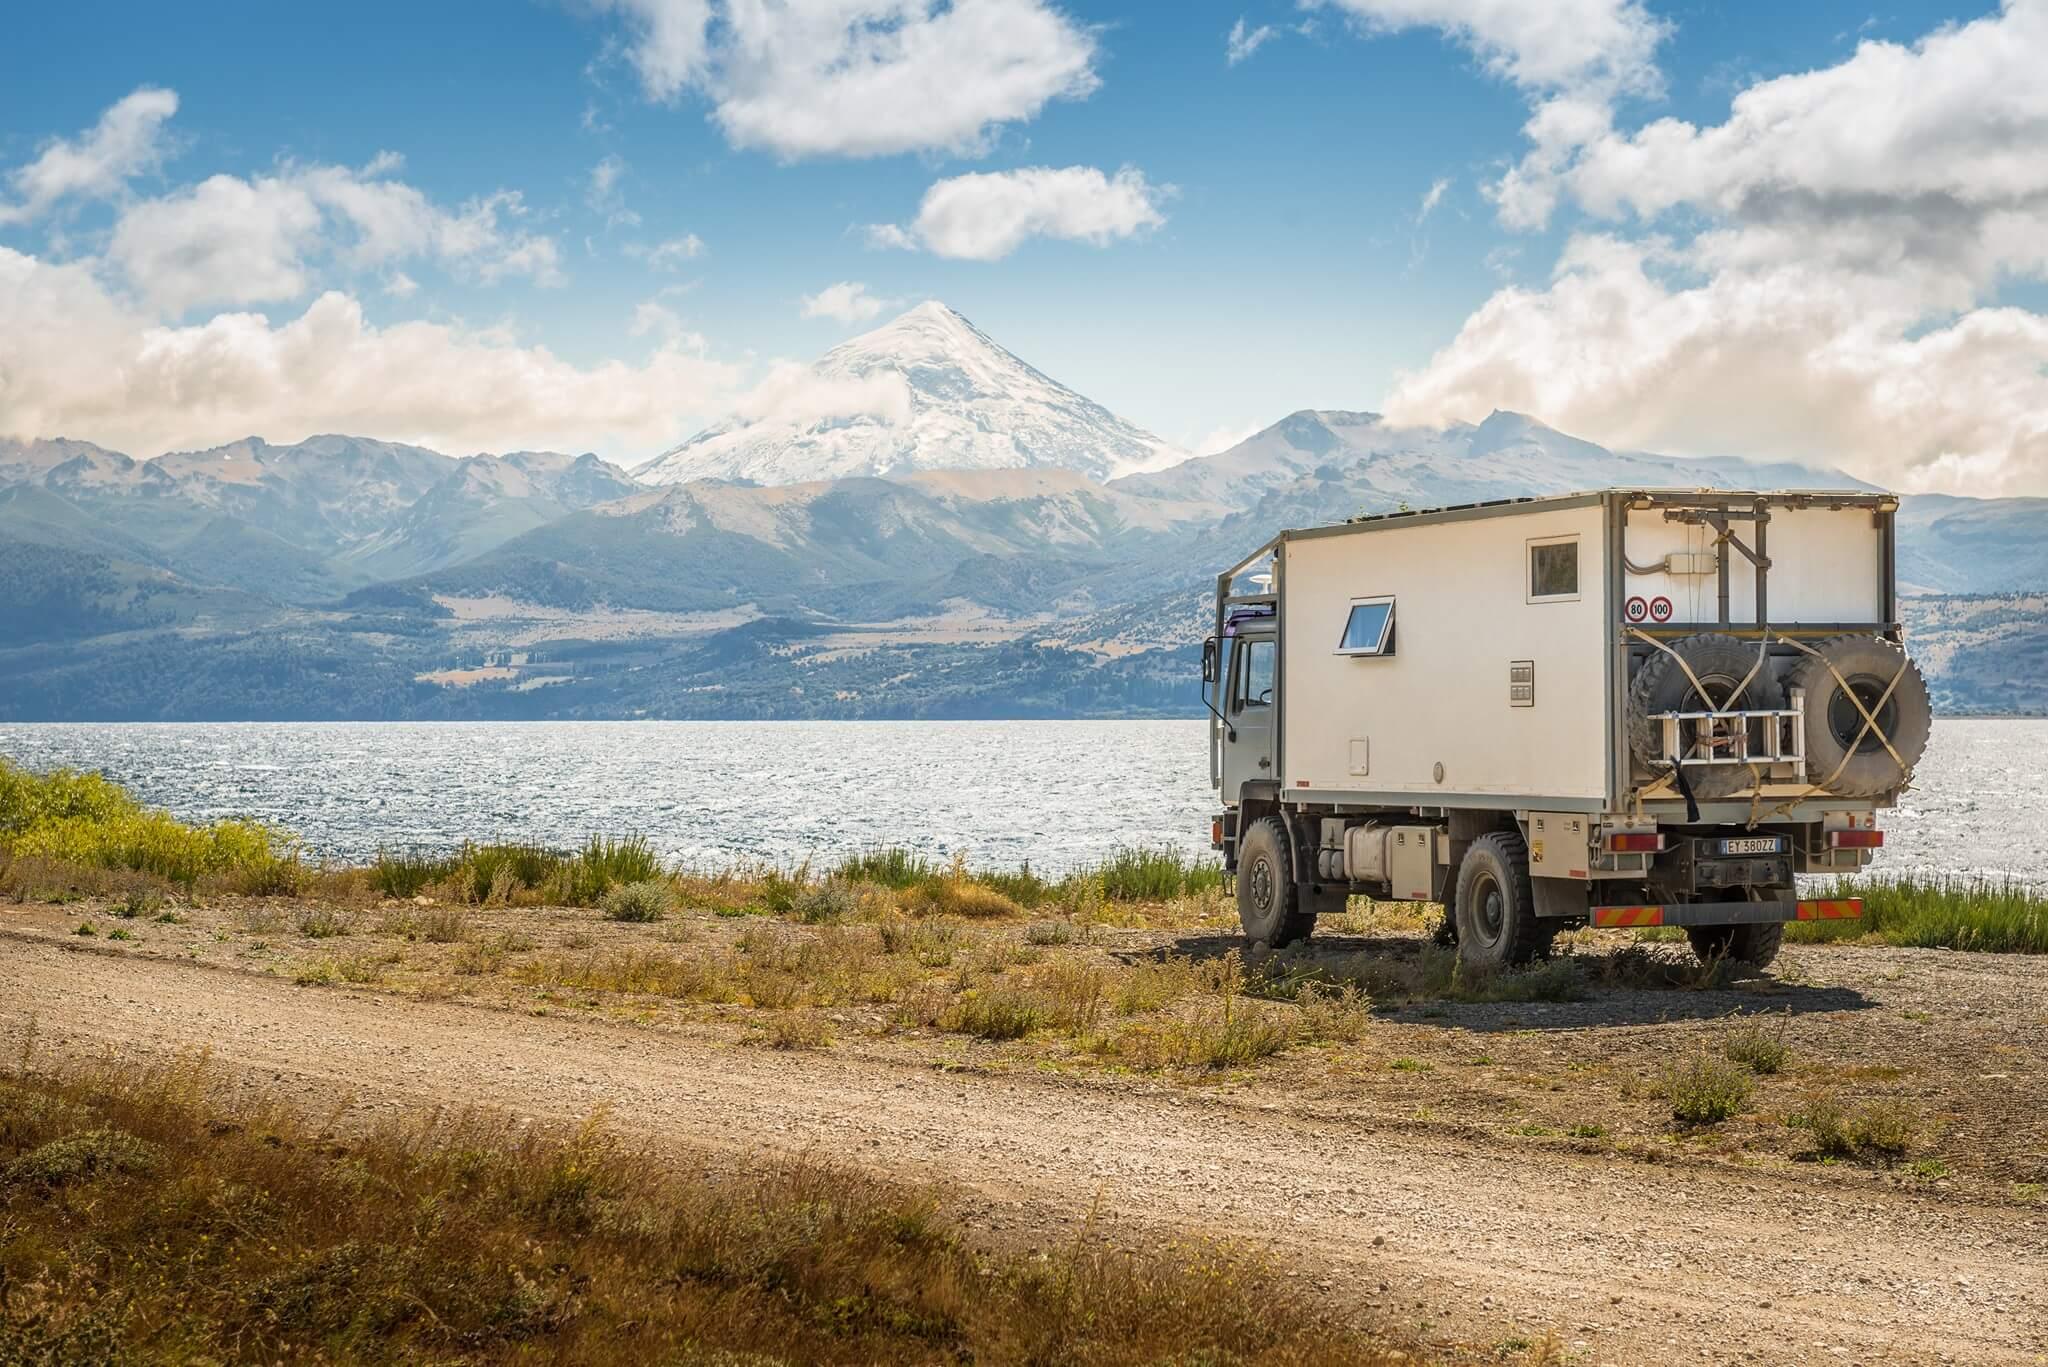 regione-dei-laghi-argentina-2